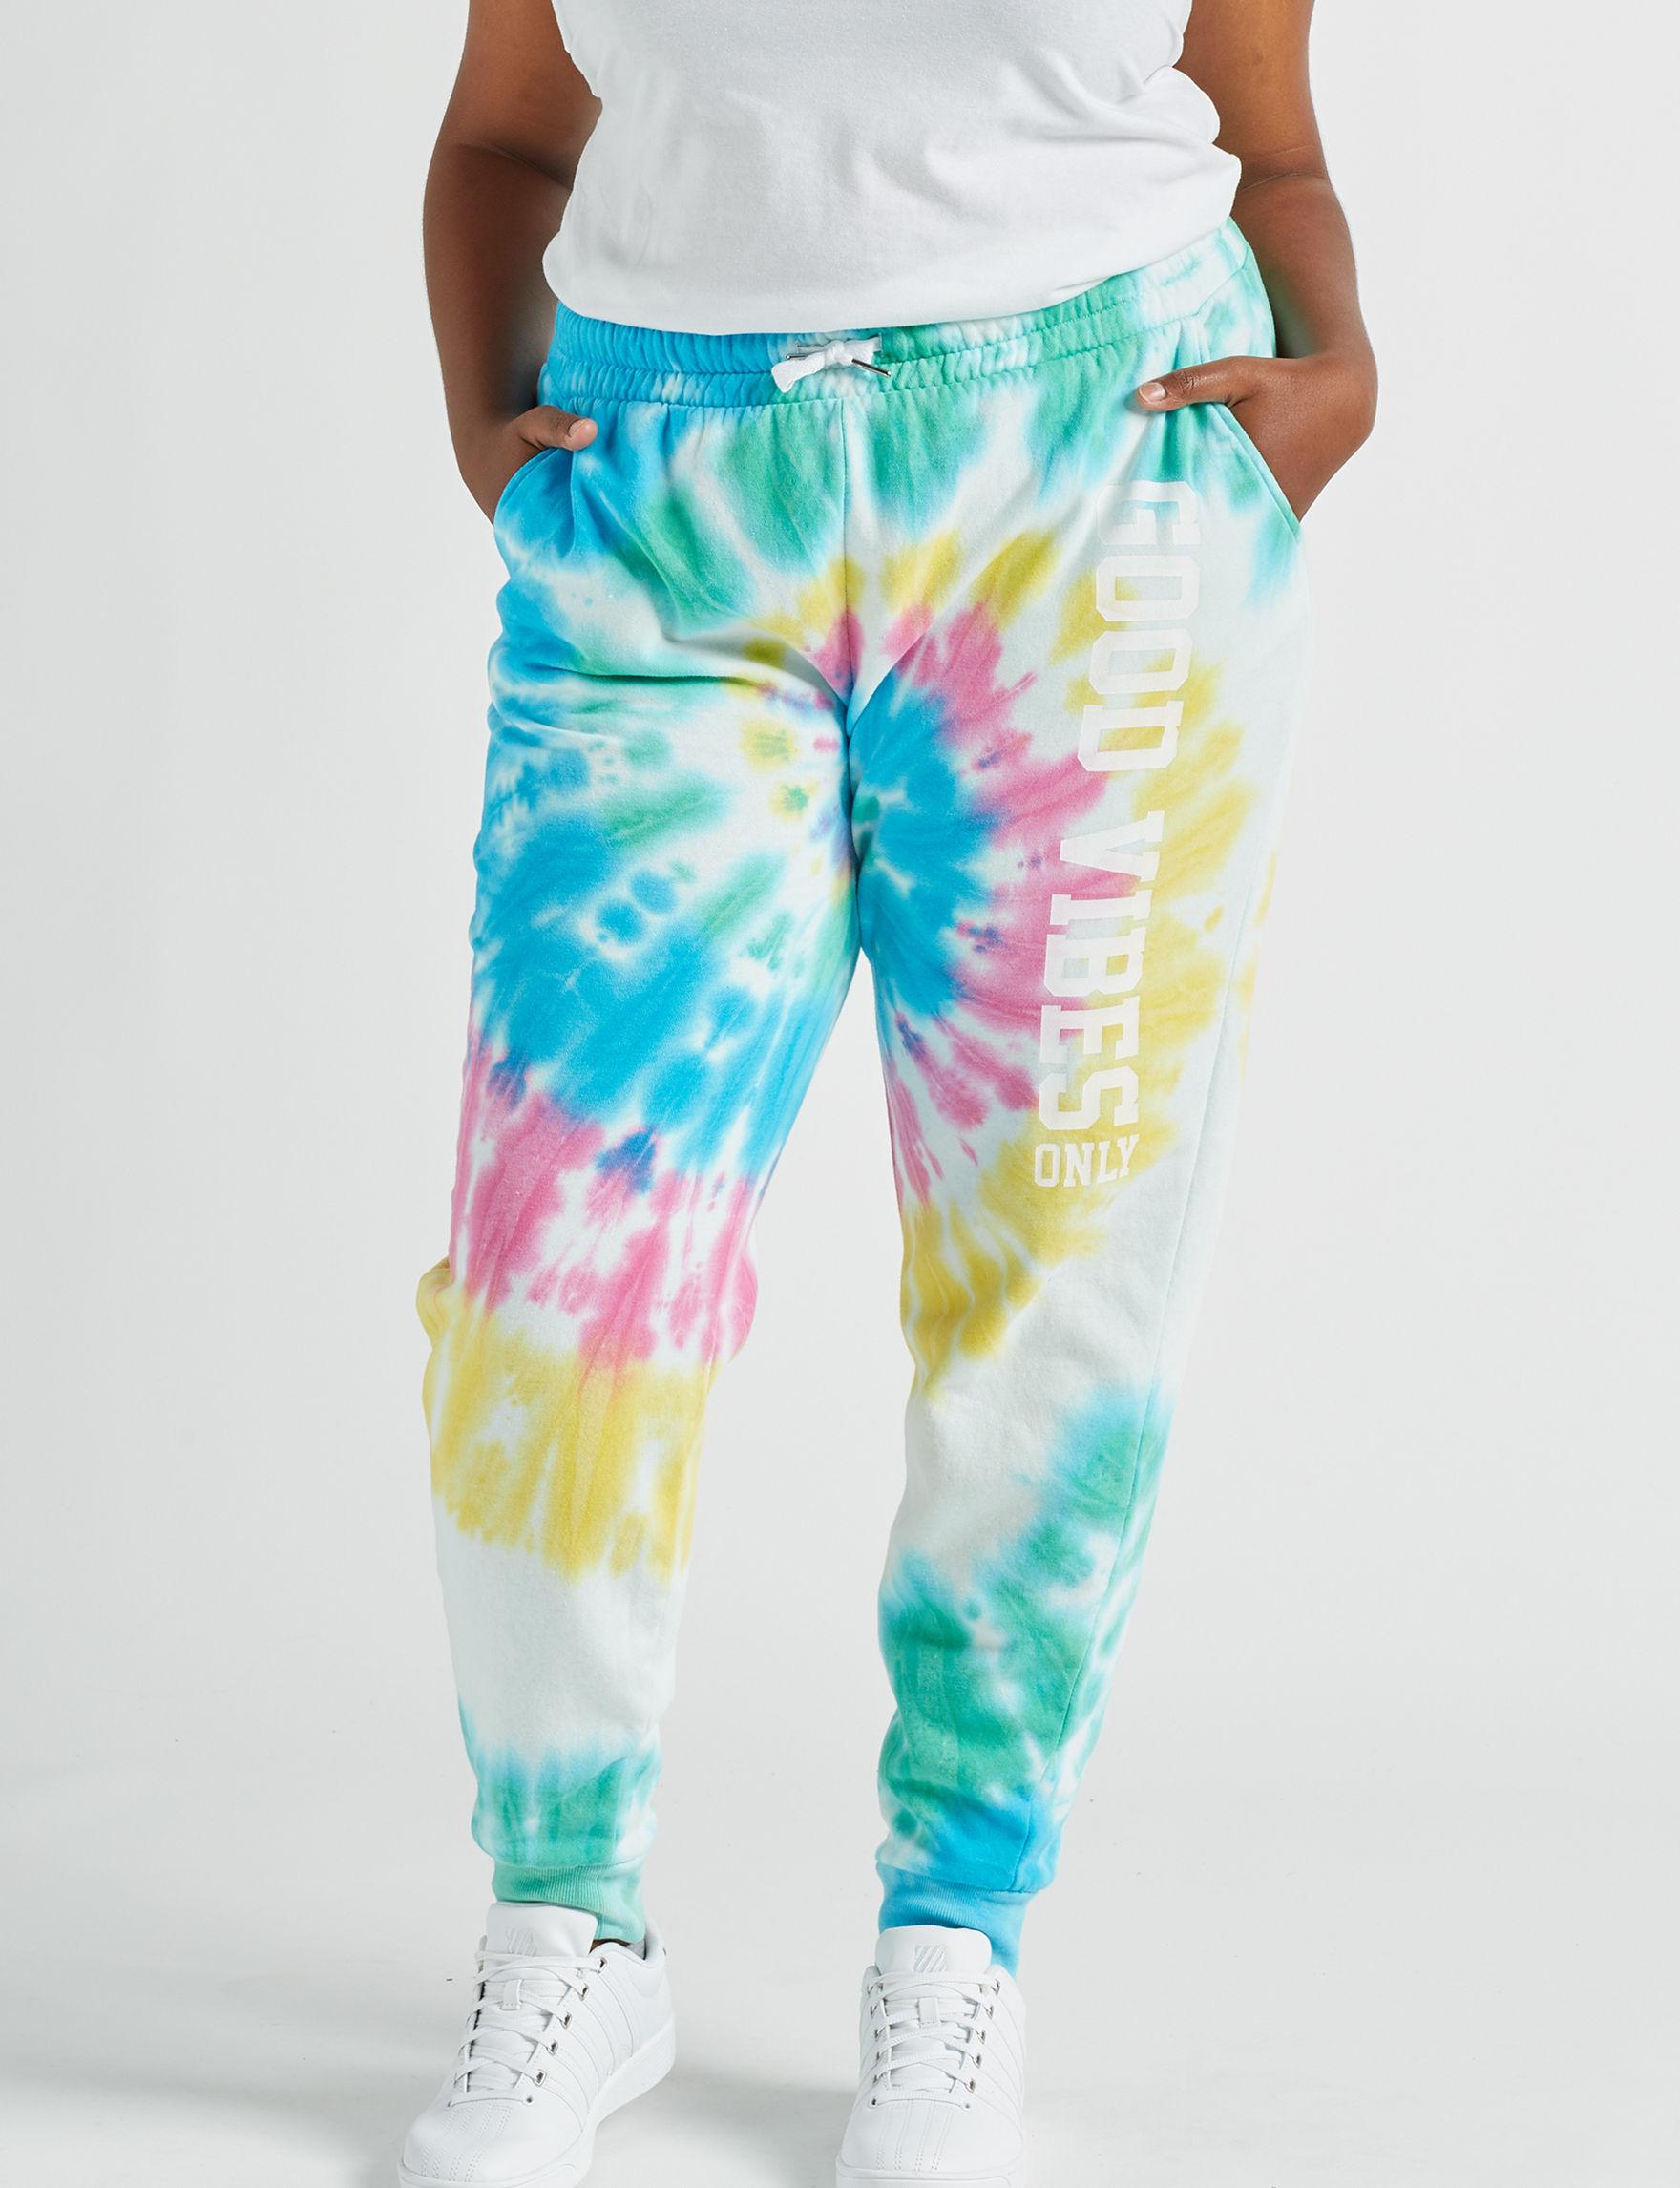 Justify Blue / Multi Soft Pants